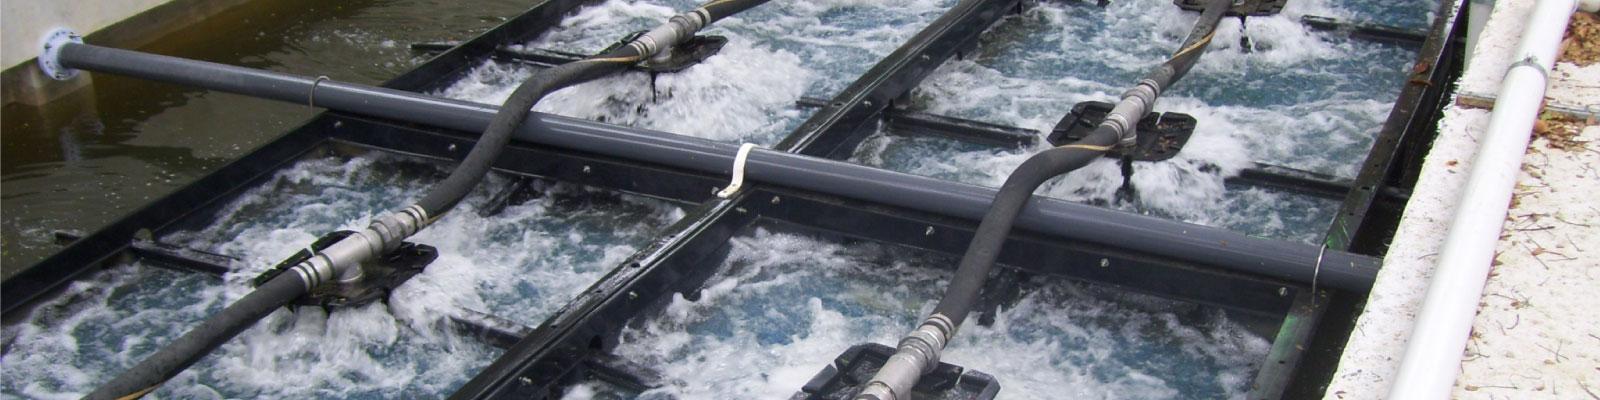 Bio Microbics Wastewater Treatment Site Specific Design Inc